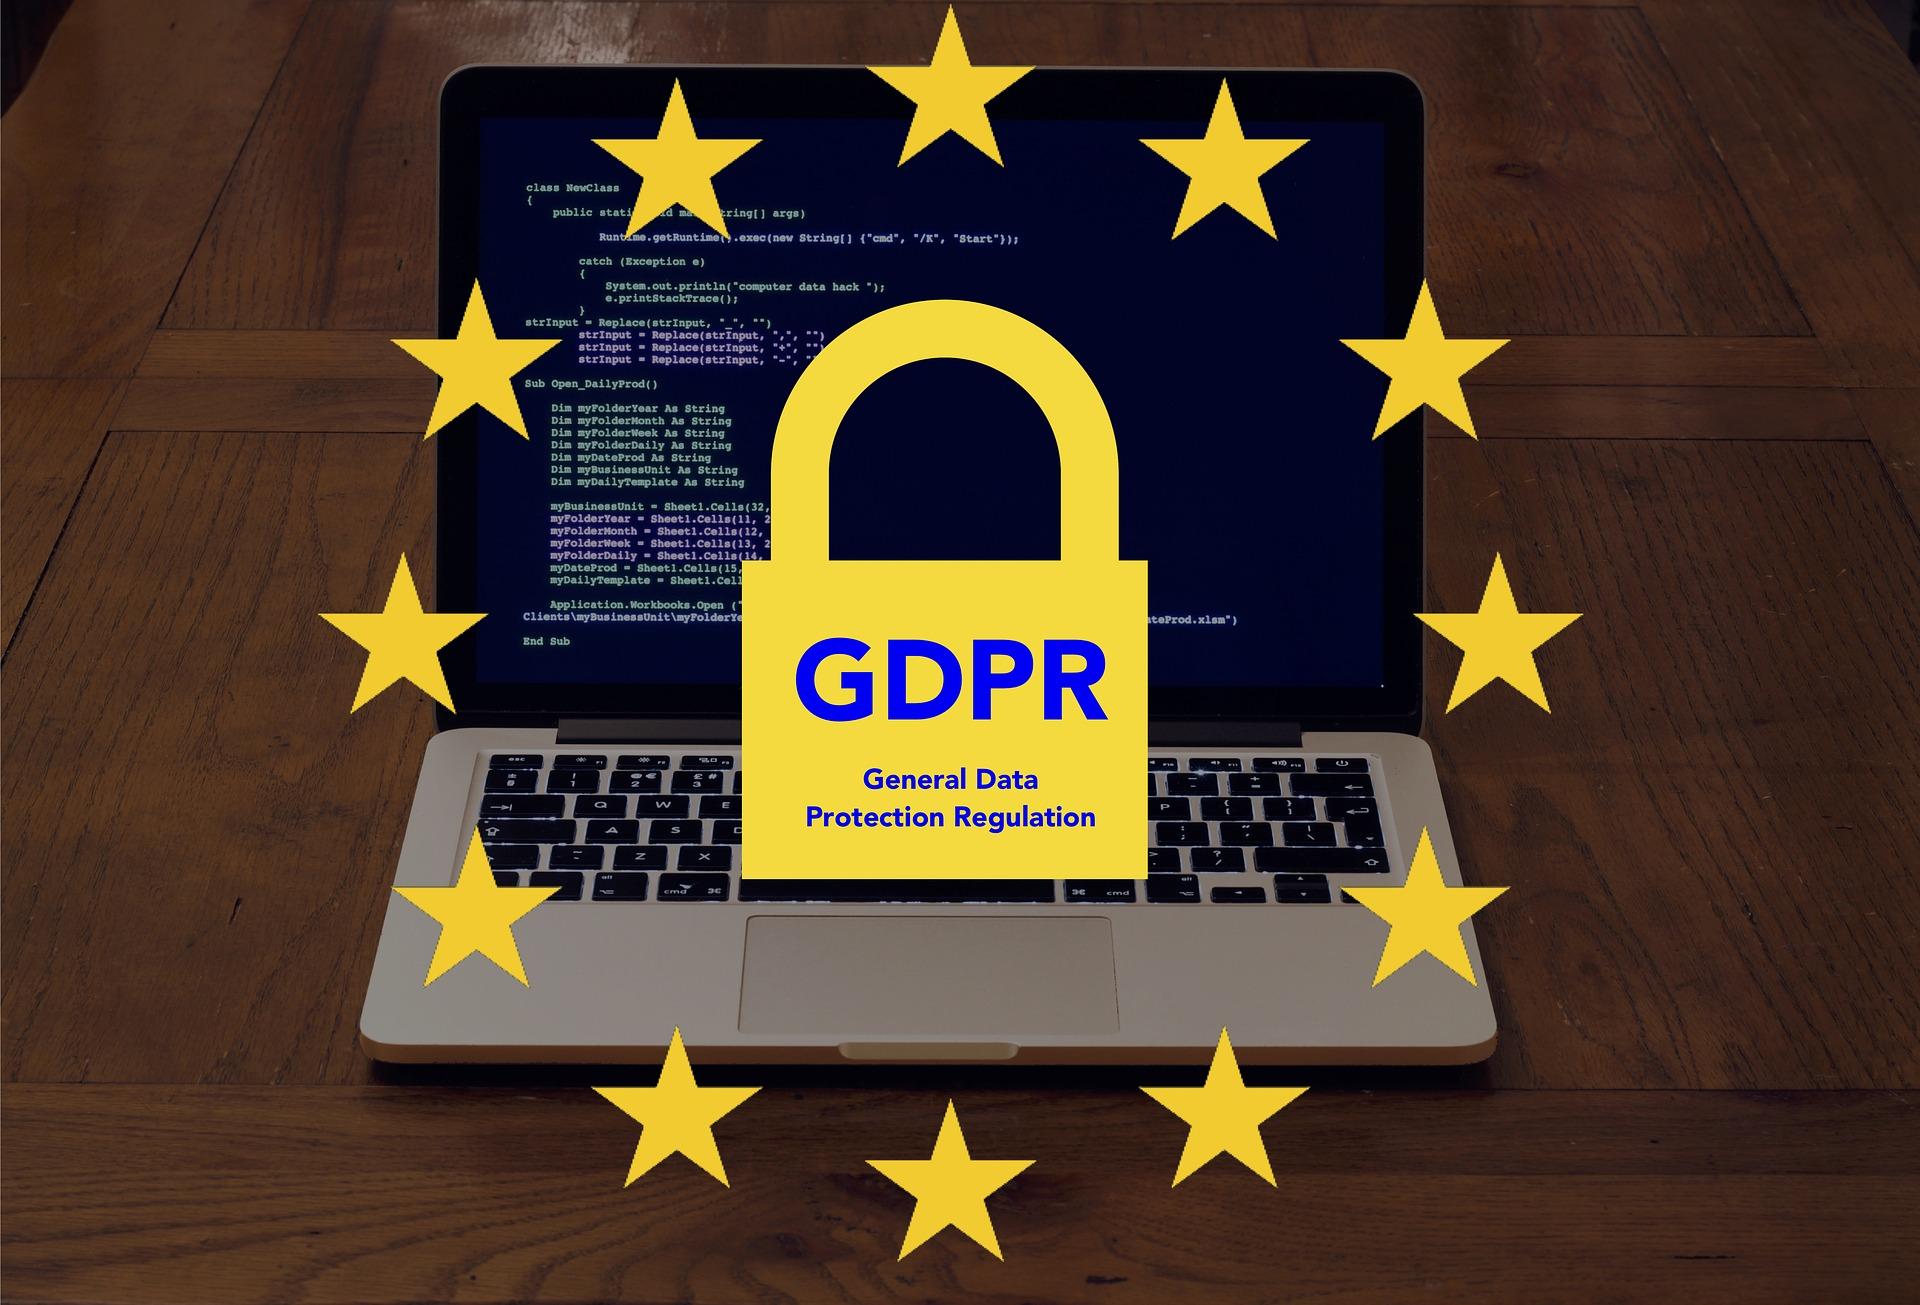 GDPR – General Data Protection Regulation